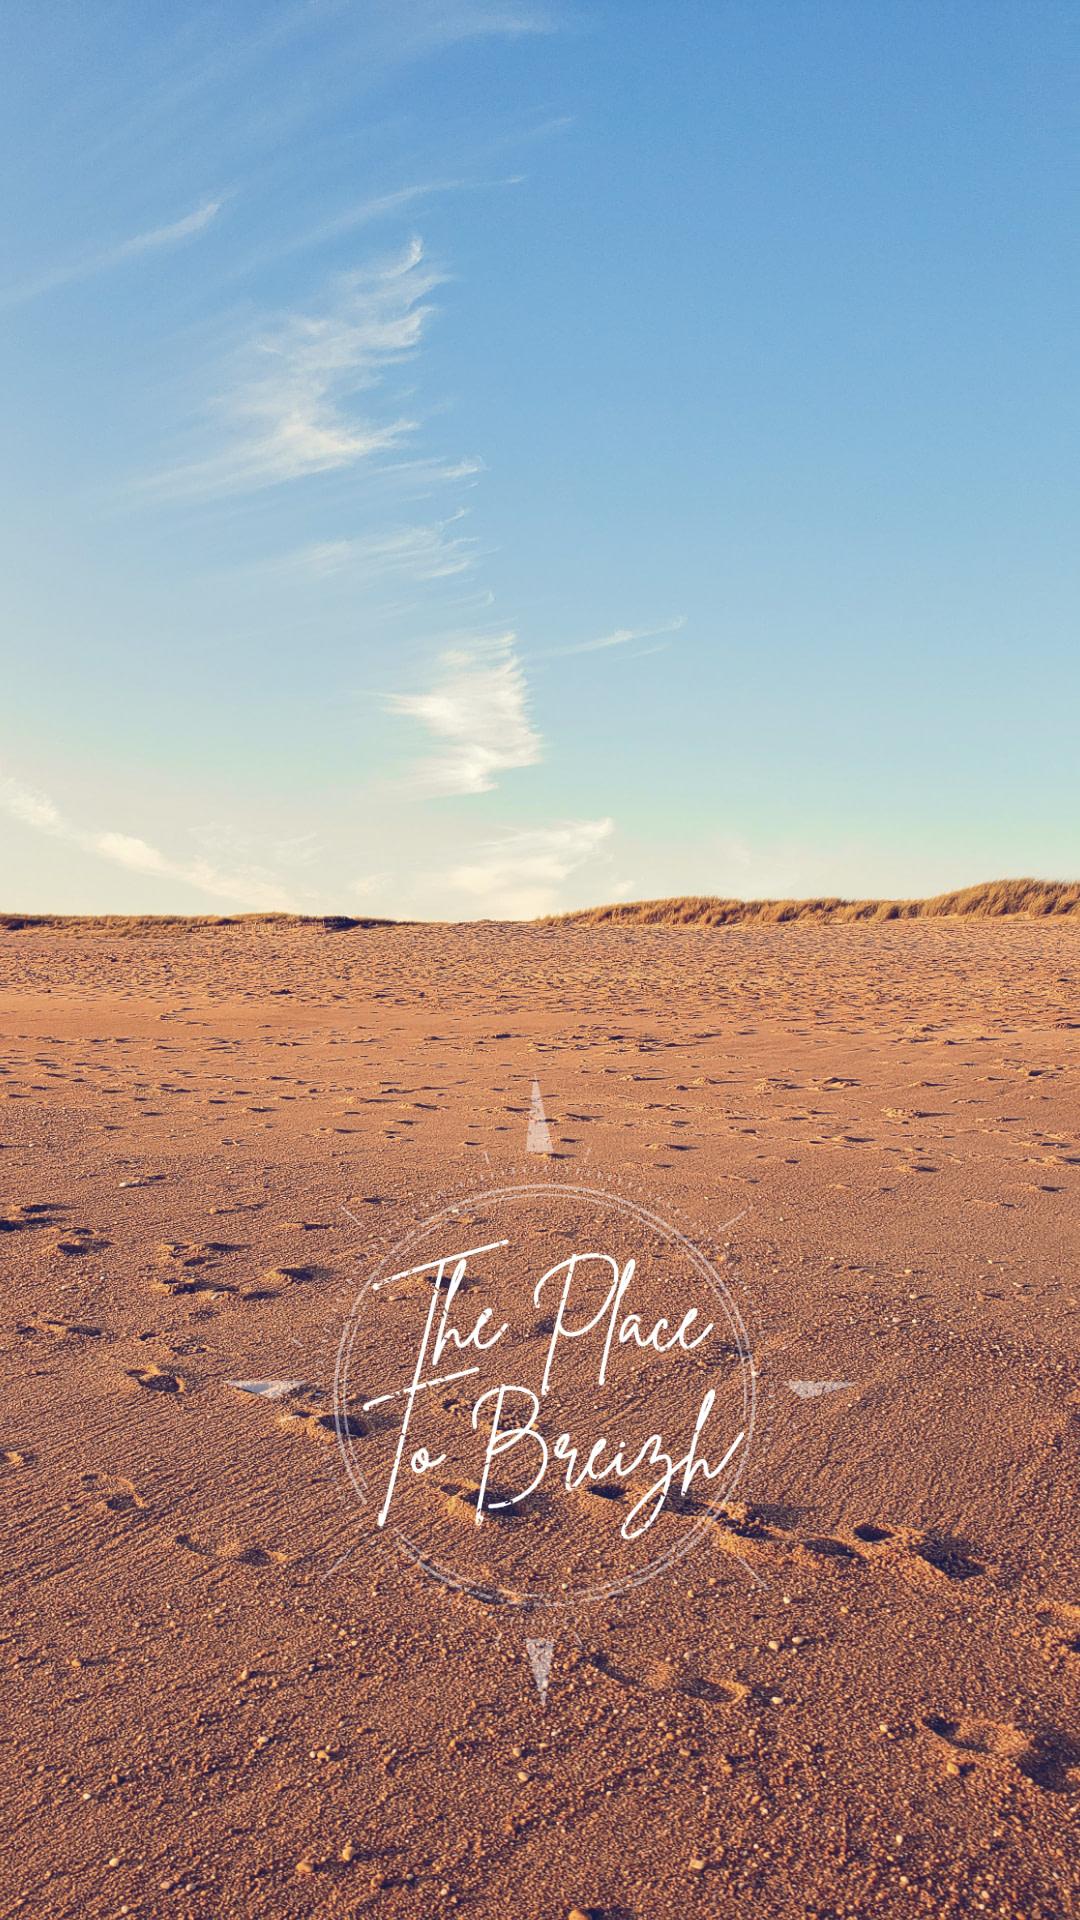 dune bretone